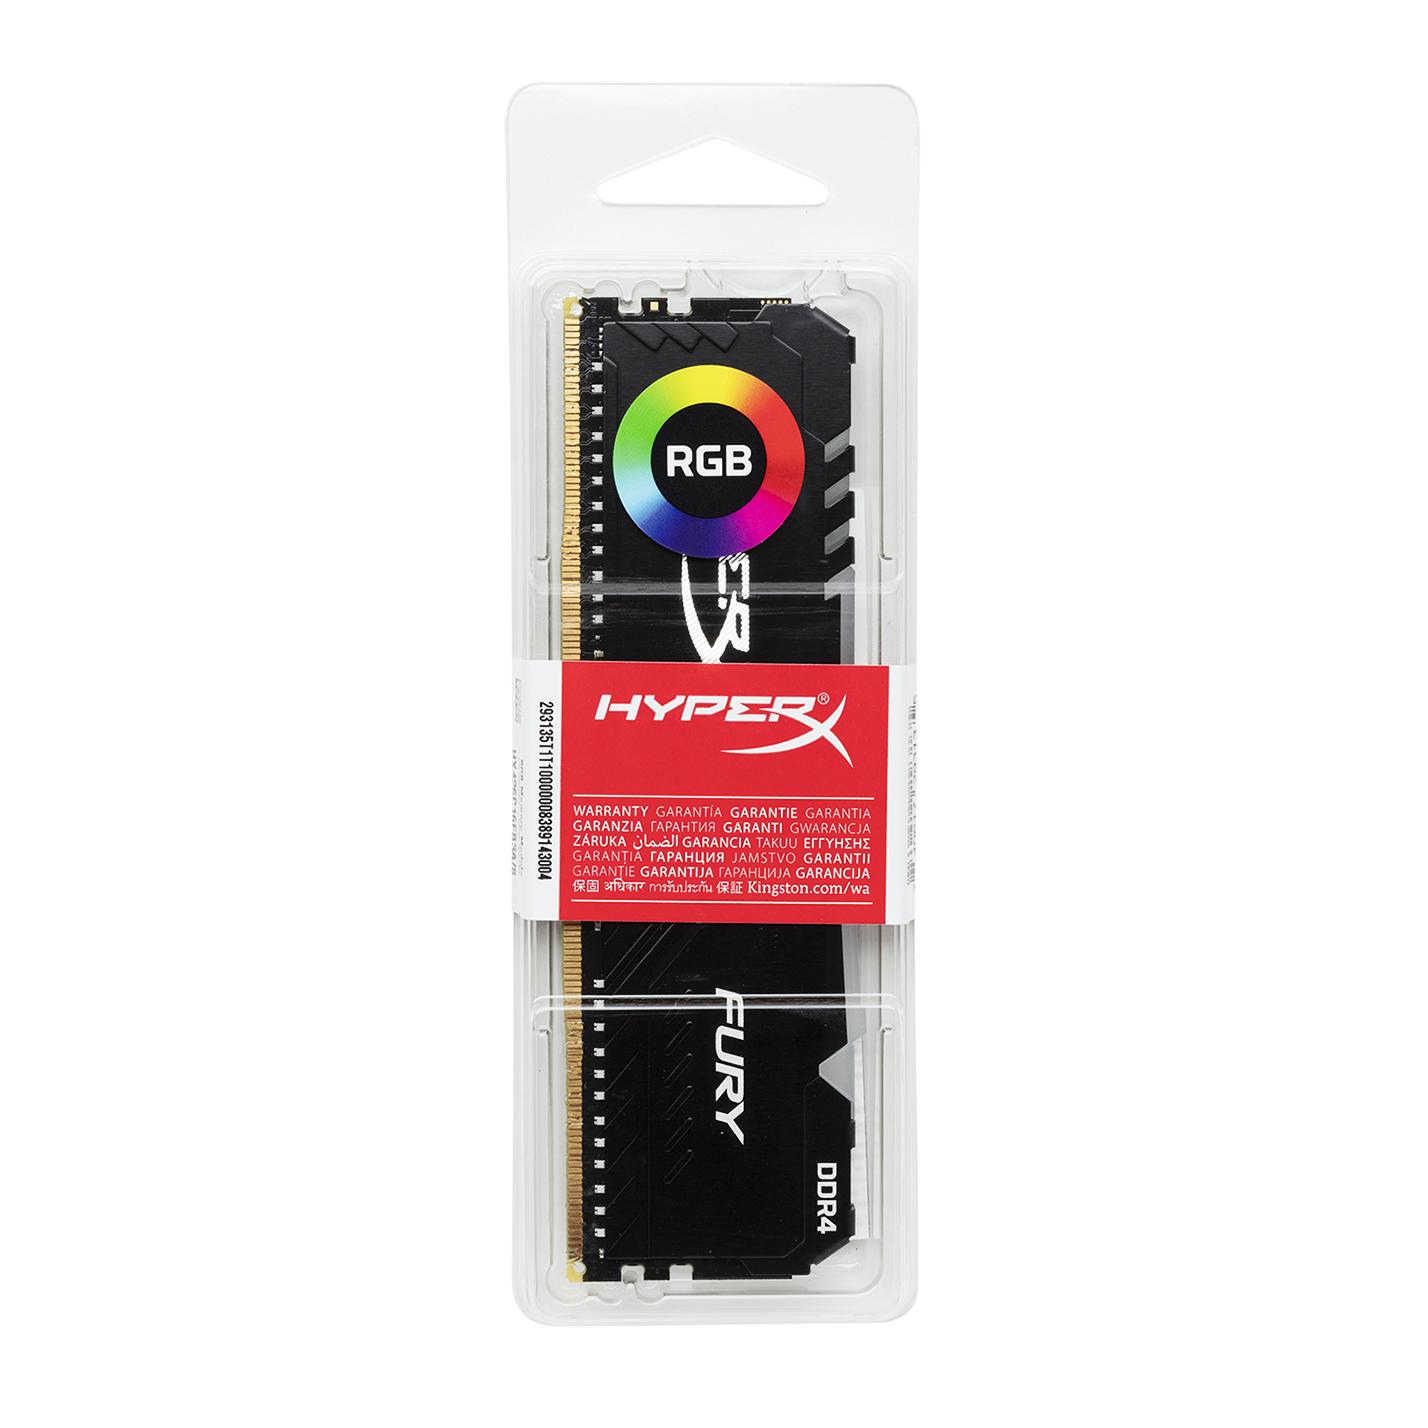 Mémoire Fury RGB 2 x 16 Go DDR4 3200 MHz HyperX Noir